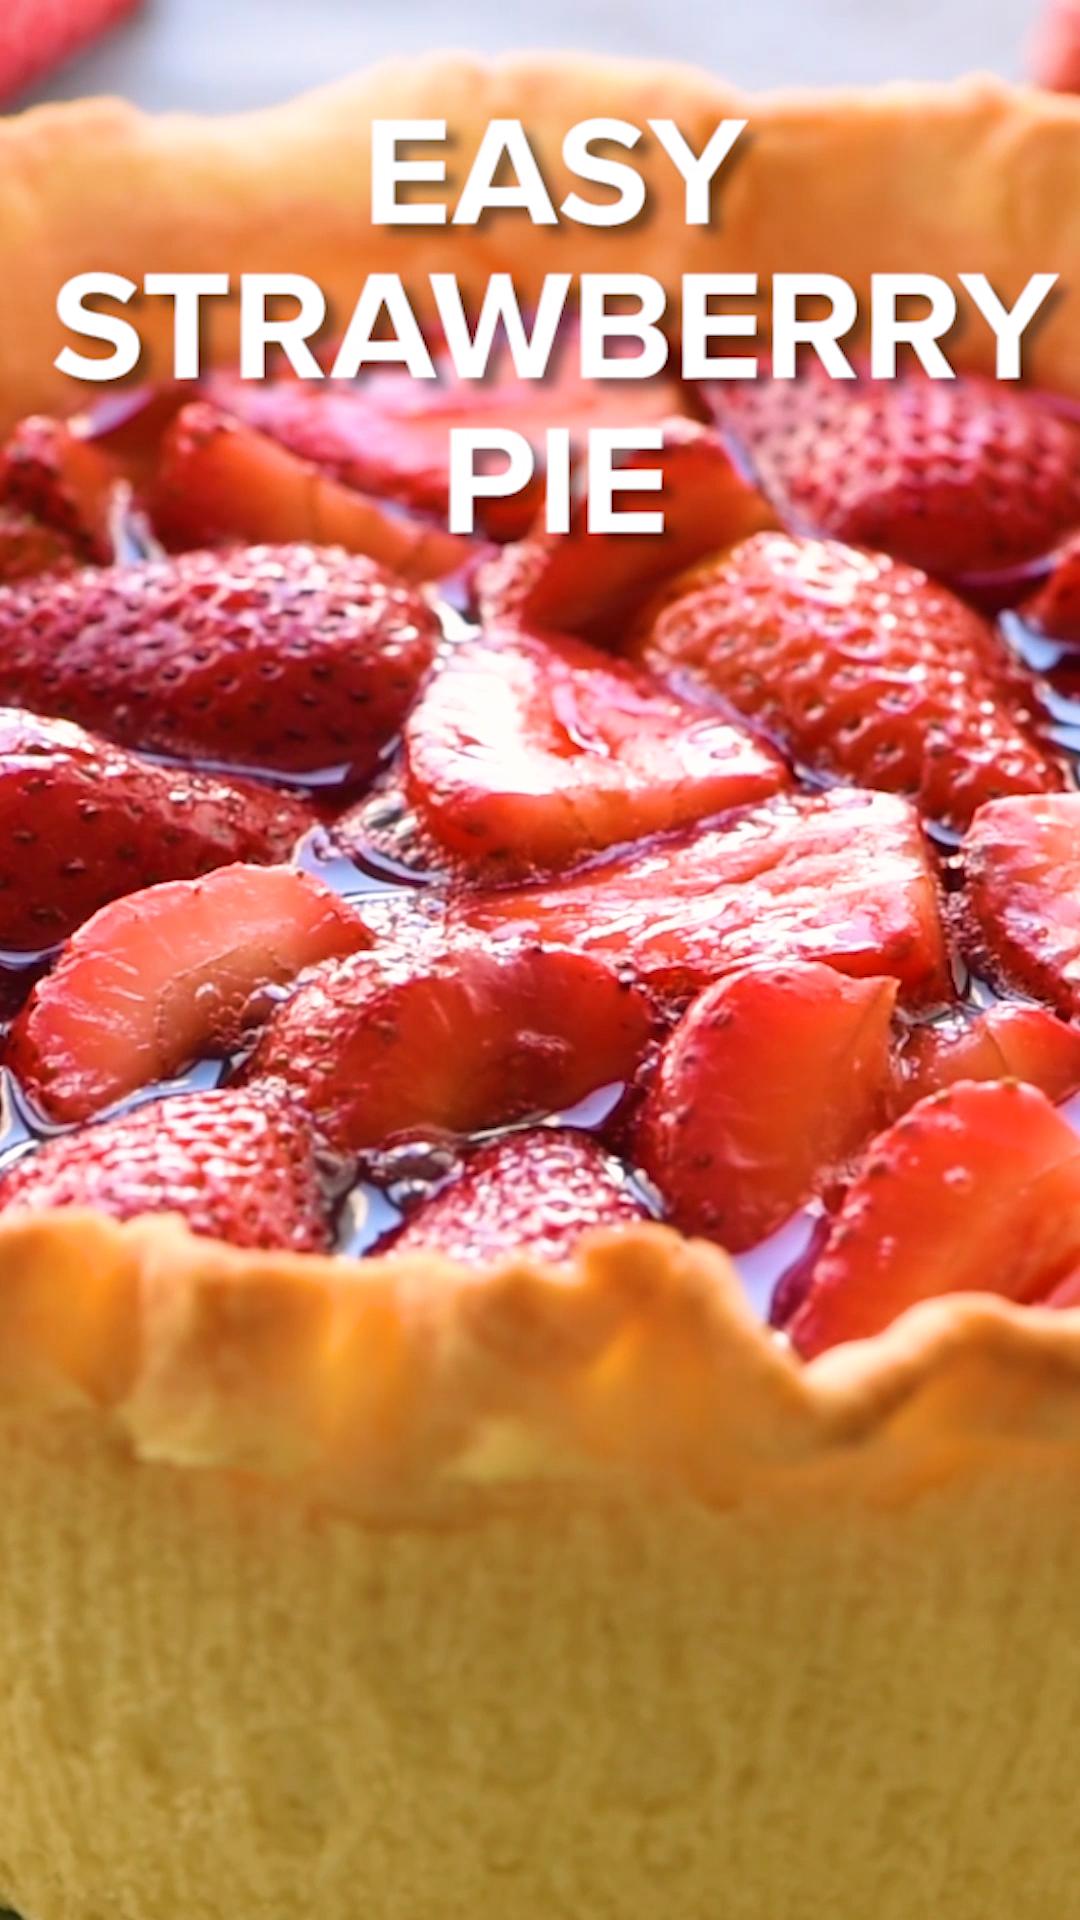 Easy Strawberry Pie images